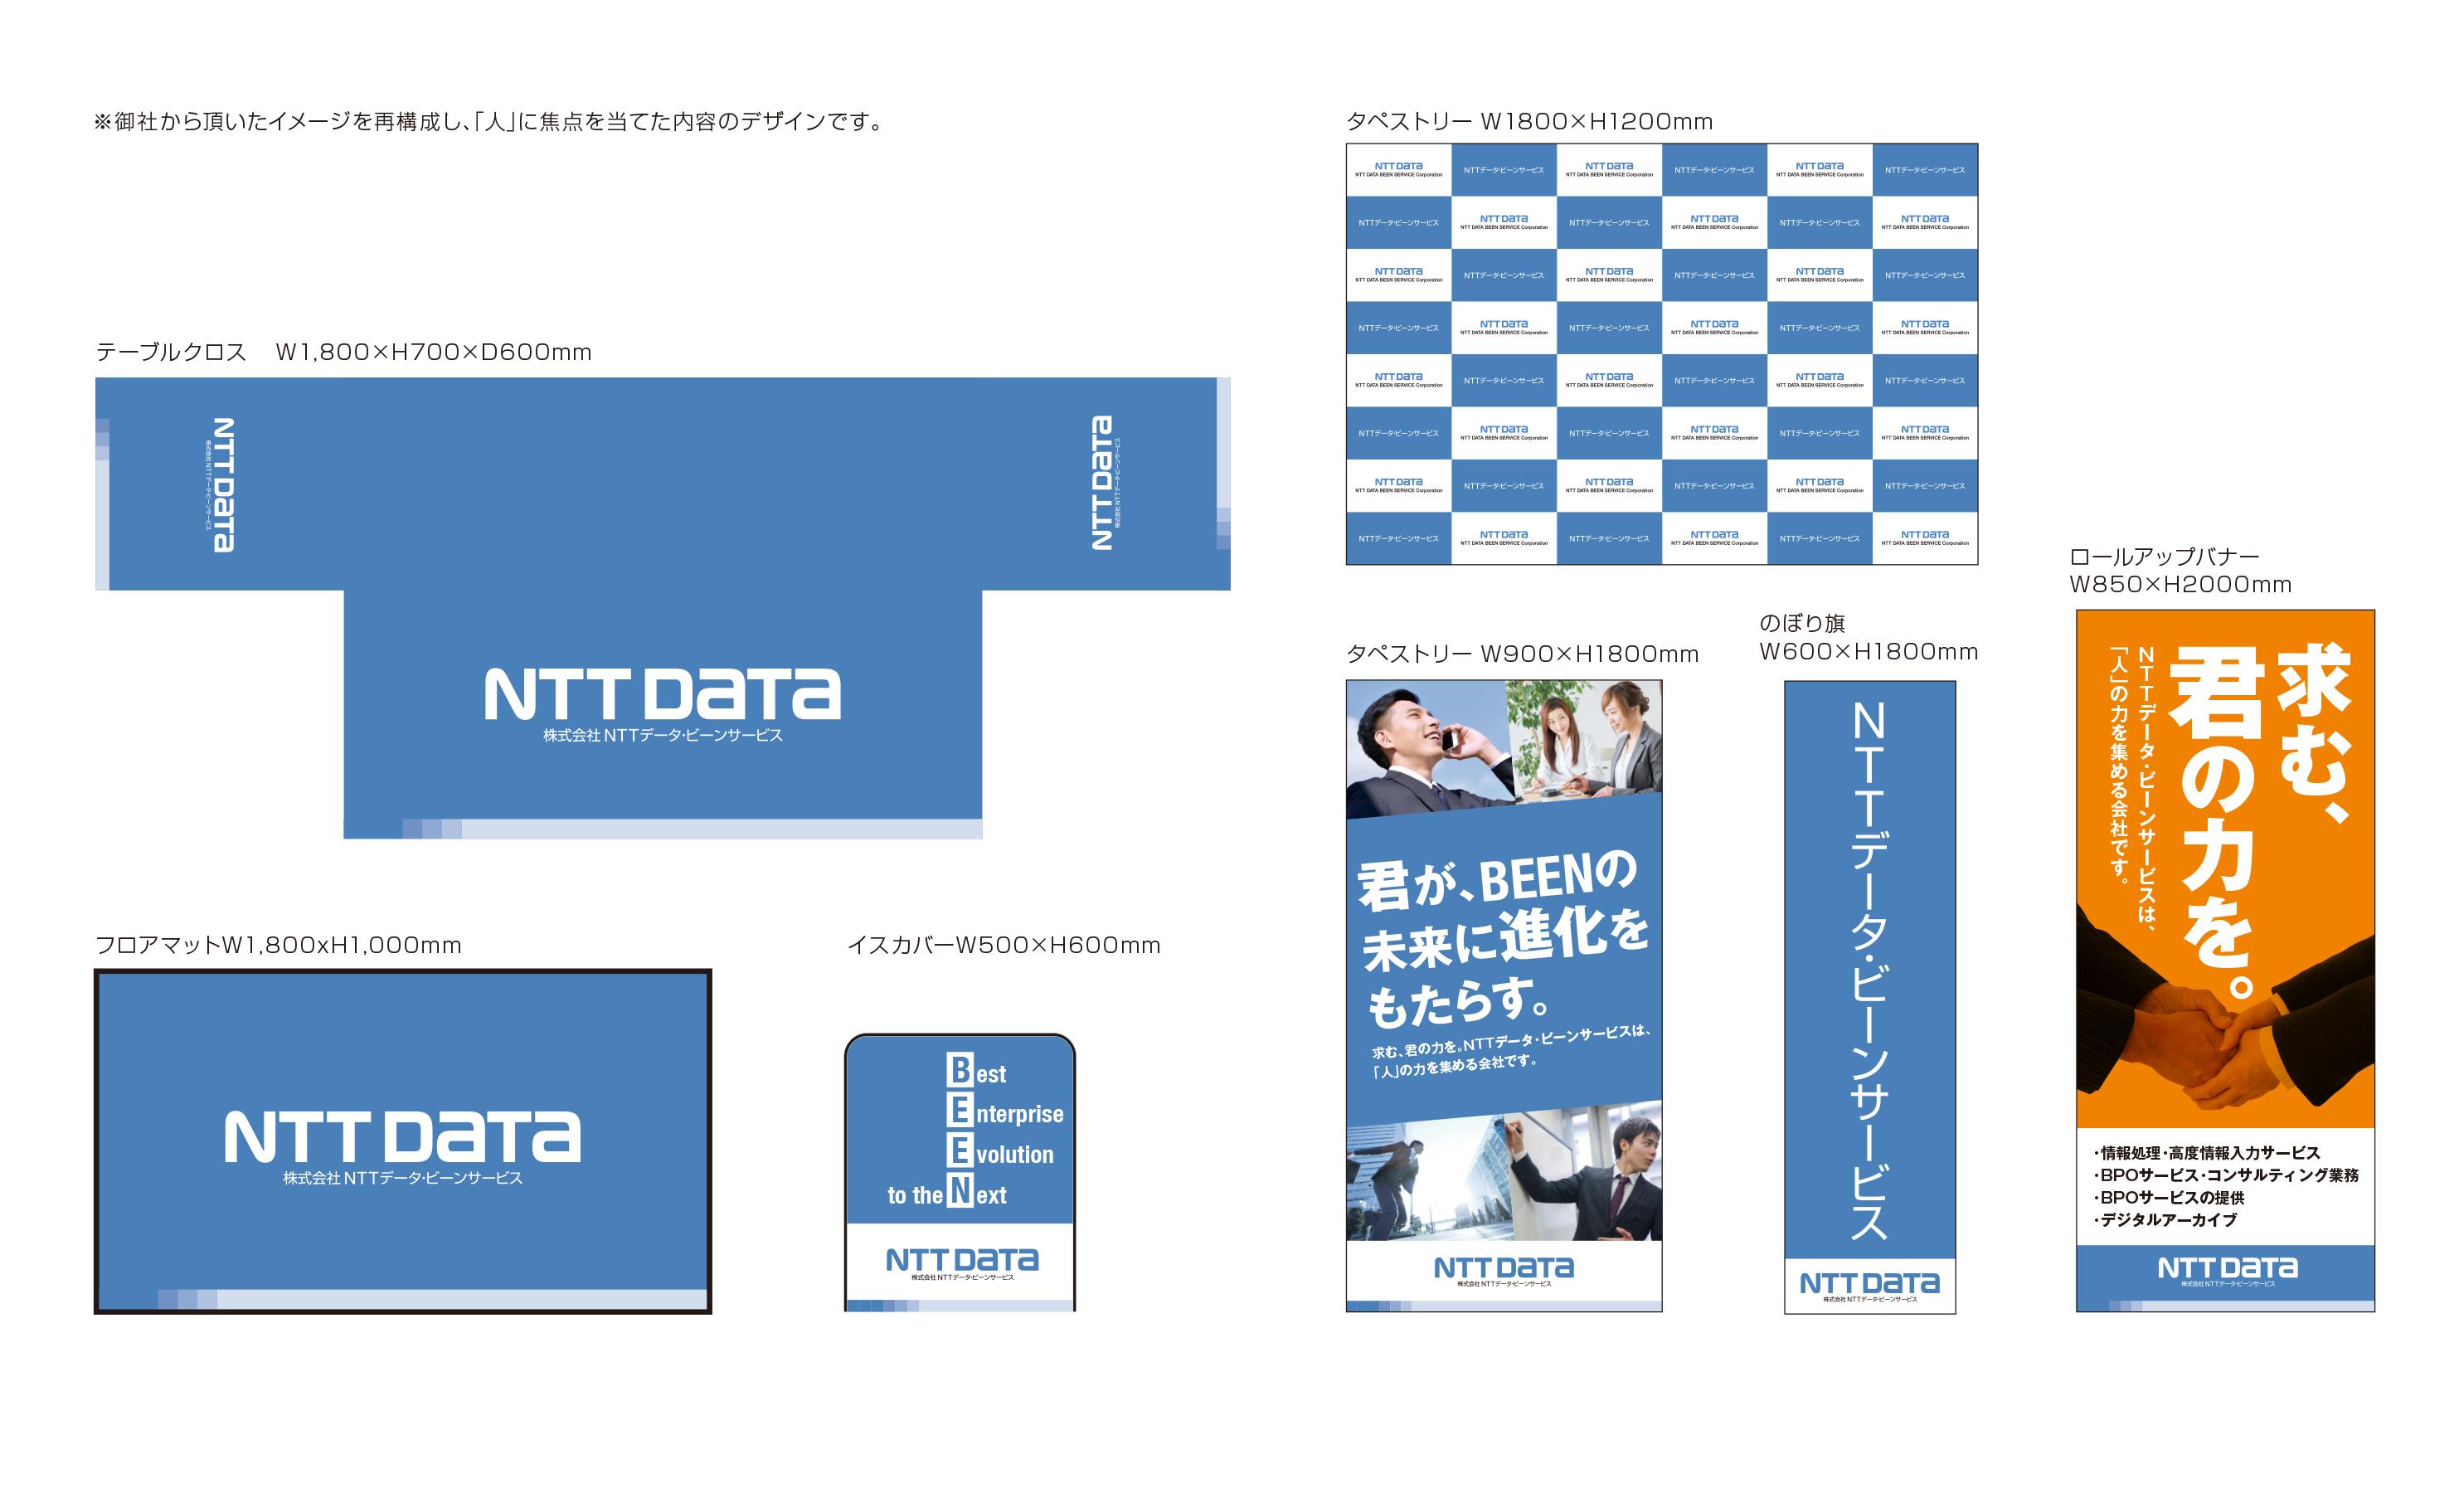 NTTデータ・ビーンサービス様